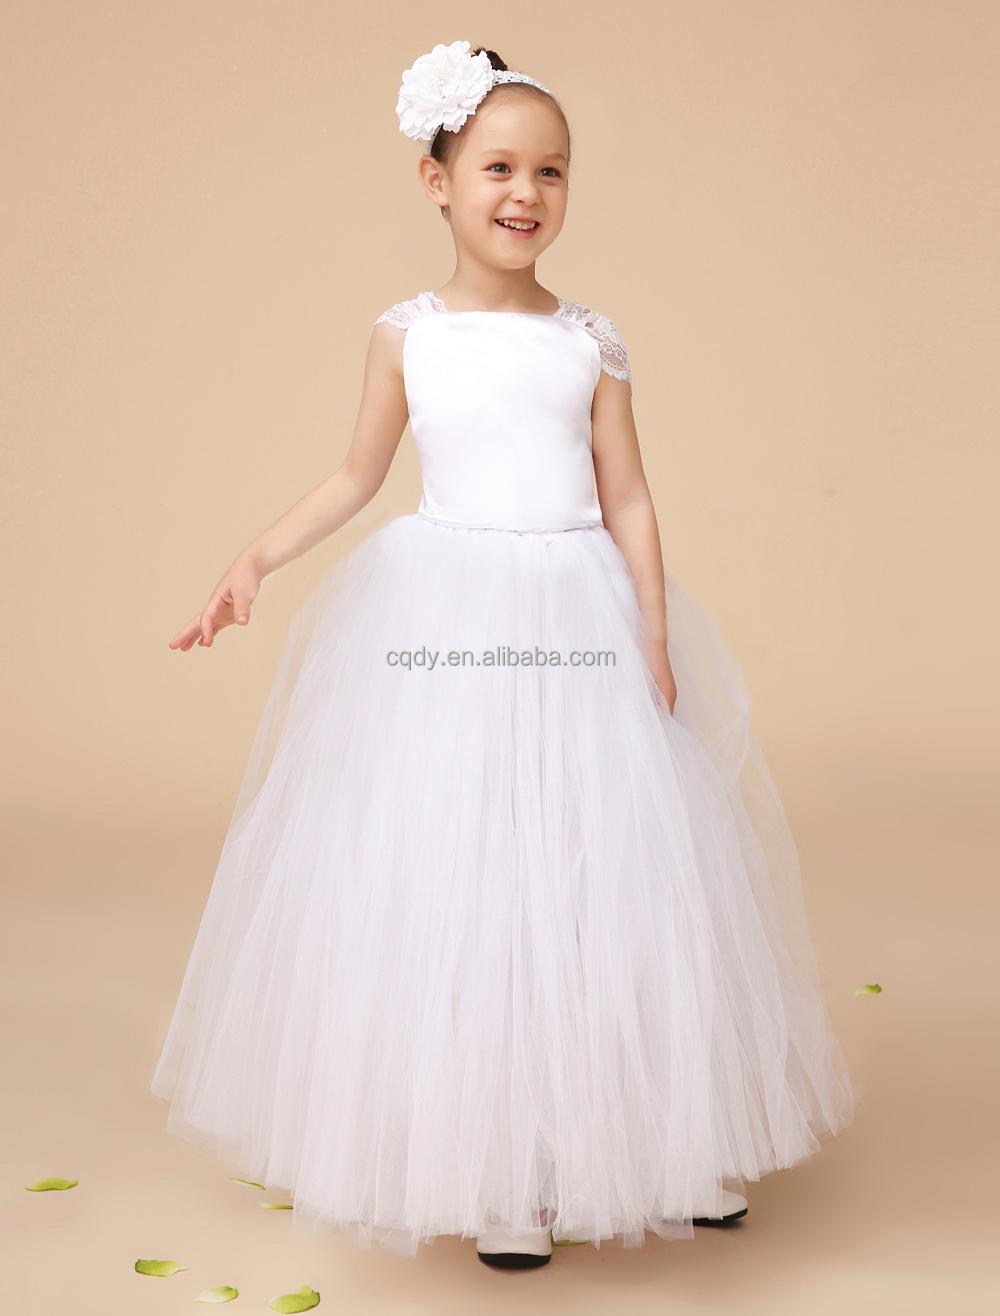 Lovely lace princess tutu dress baby girls party dresses flower jpg a37742c5 fcd3 4029 a56b cbf68b8391cb izmirmasajfo